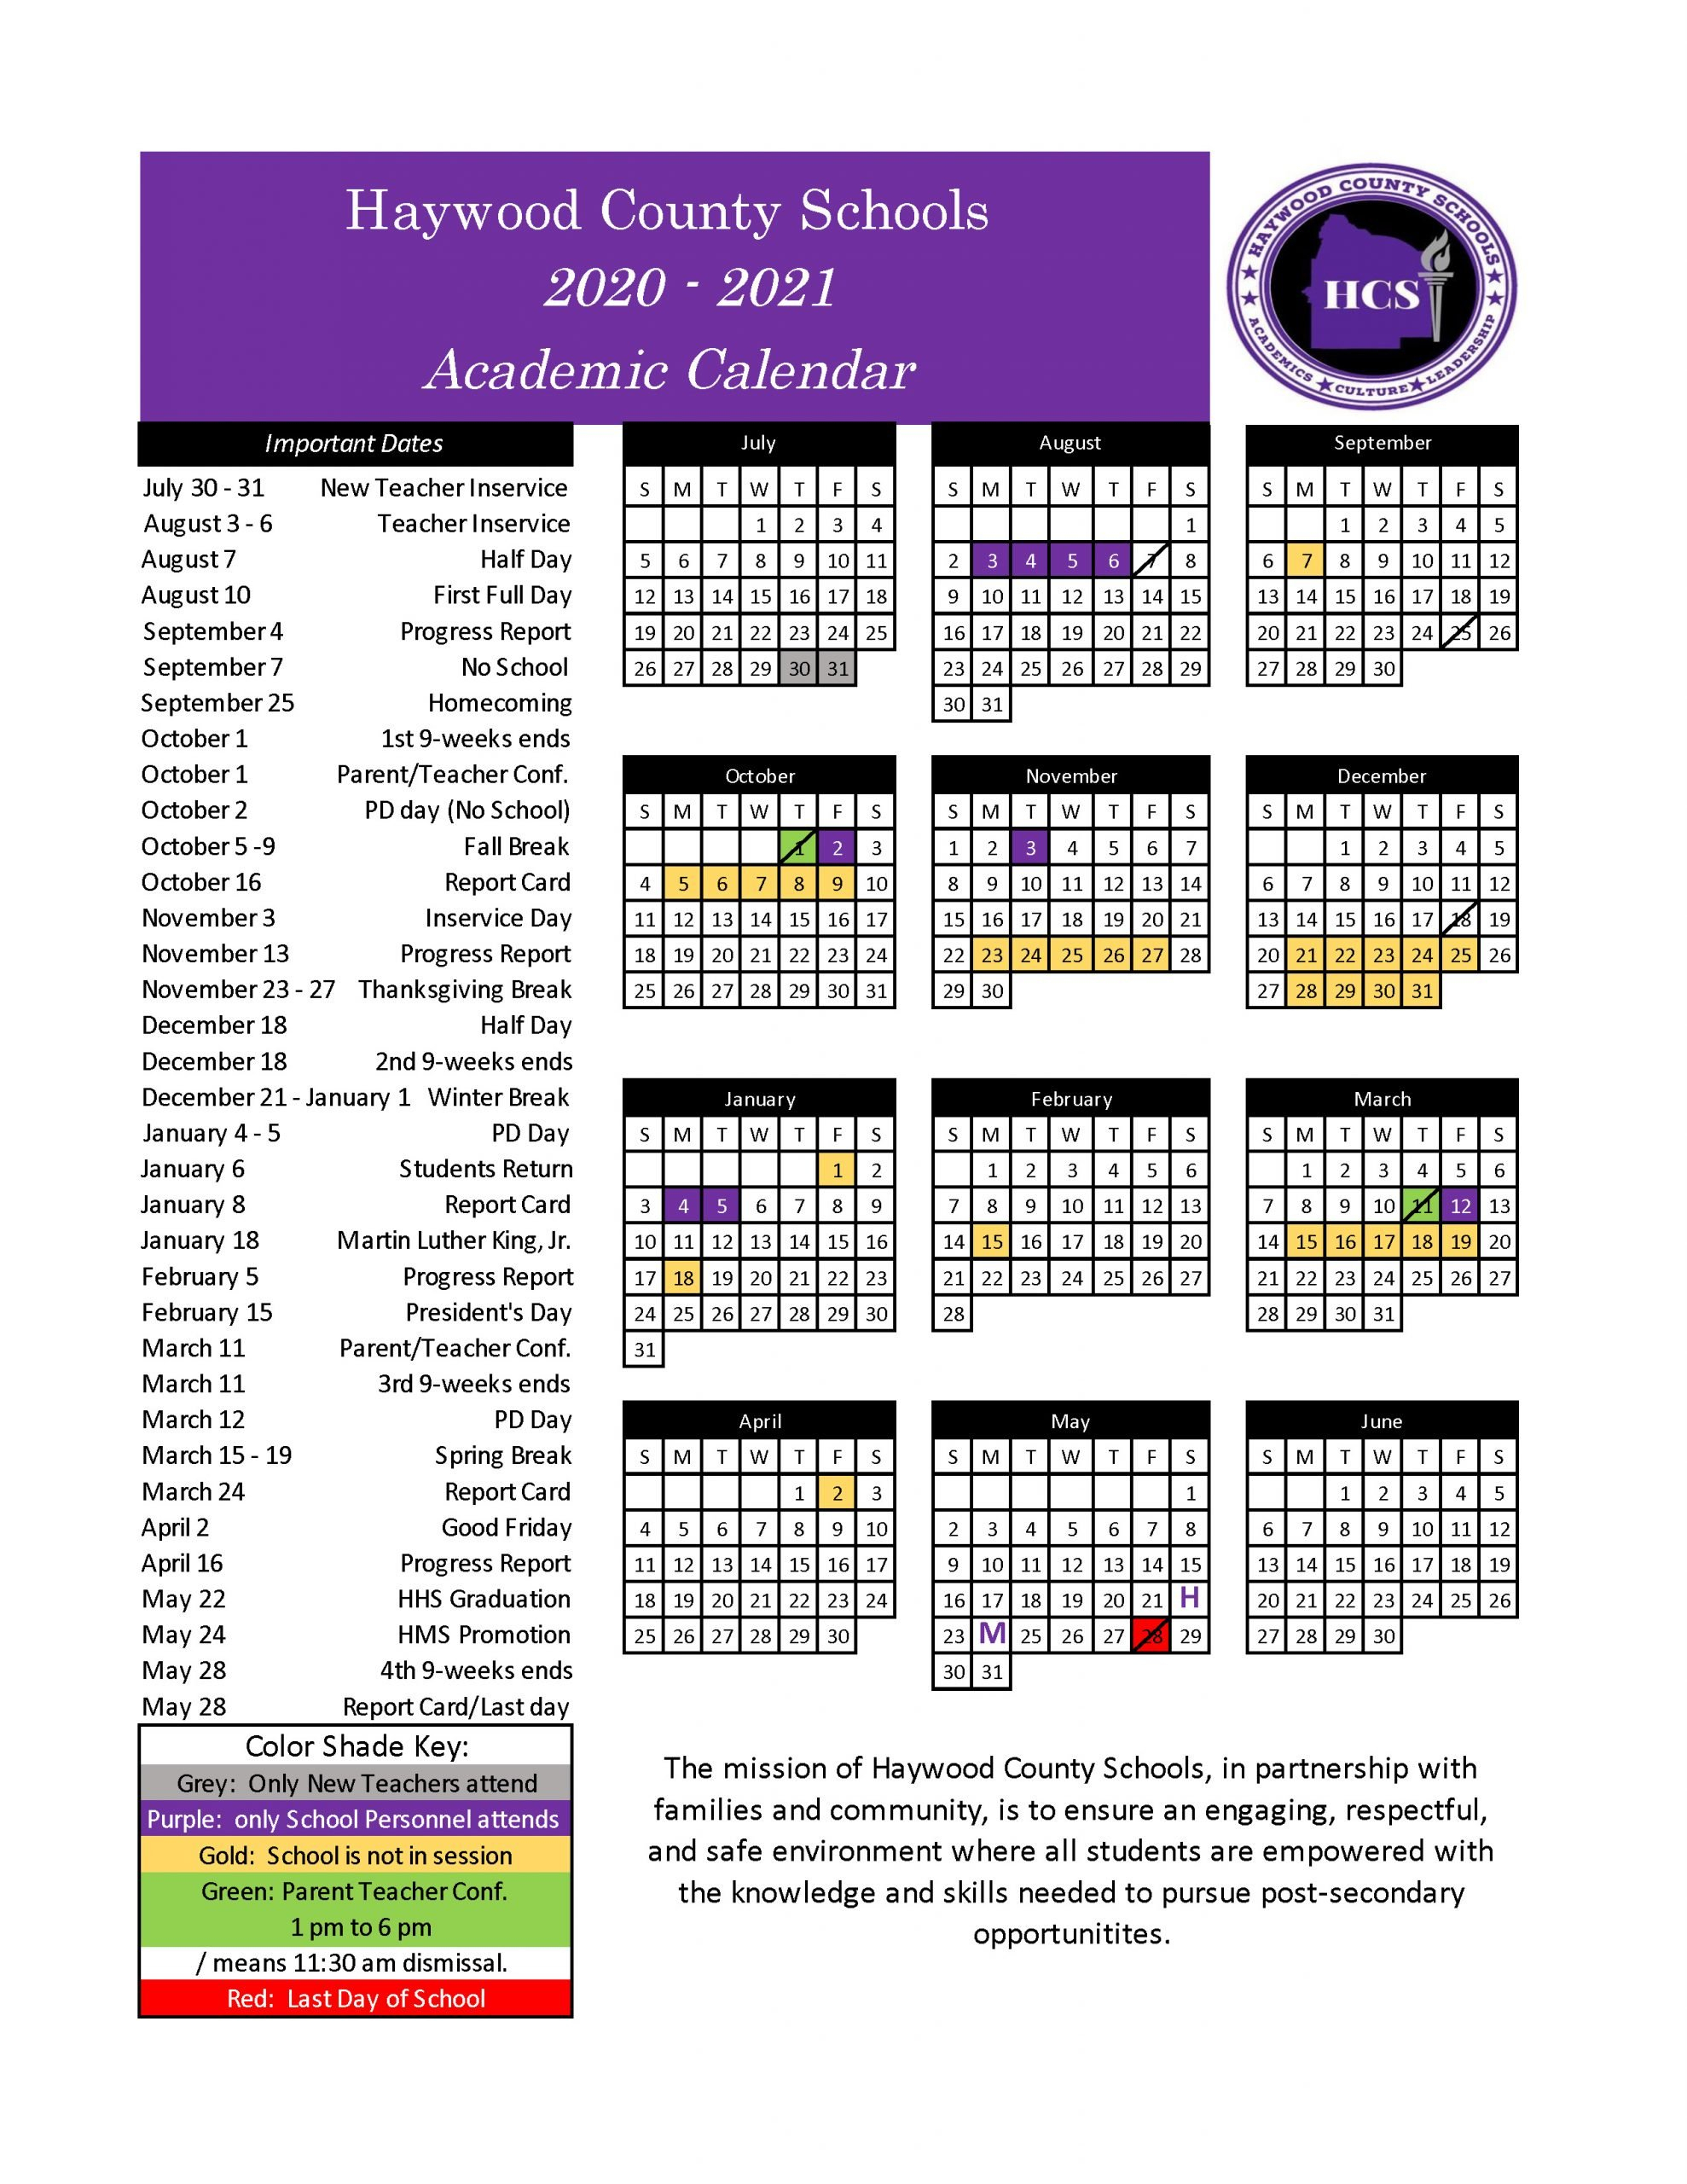 Hayward Unified School District Calendar 2021 | Printable Inside Las Cruces Public School Calendar 2021